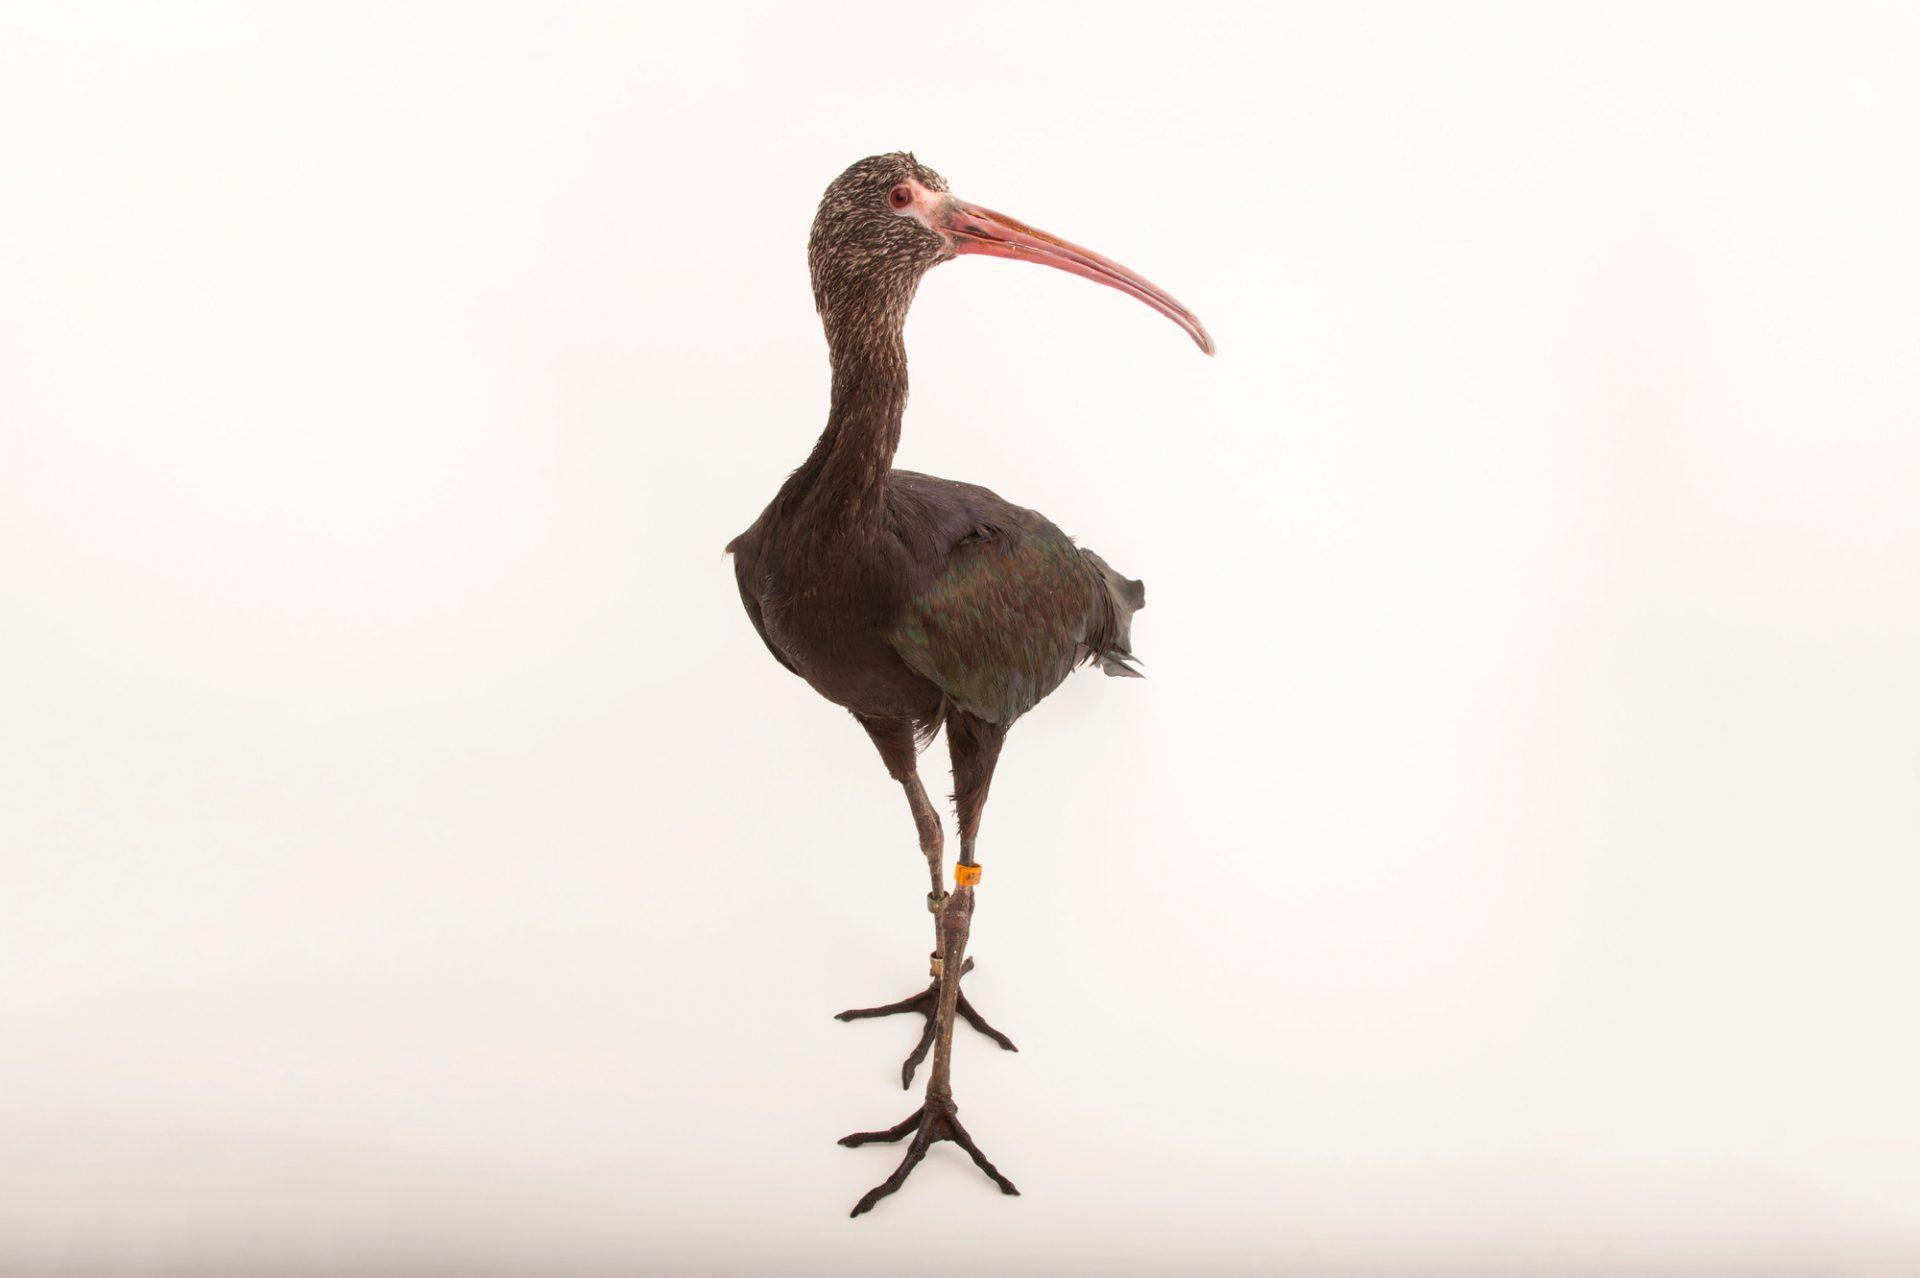 A puna ibis (Plegadis ridgwayi) at the Sedgwick County Zoo in Wichita, Kansas.